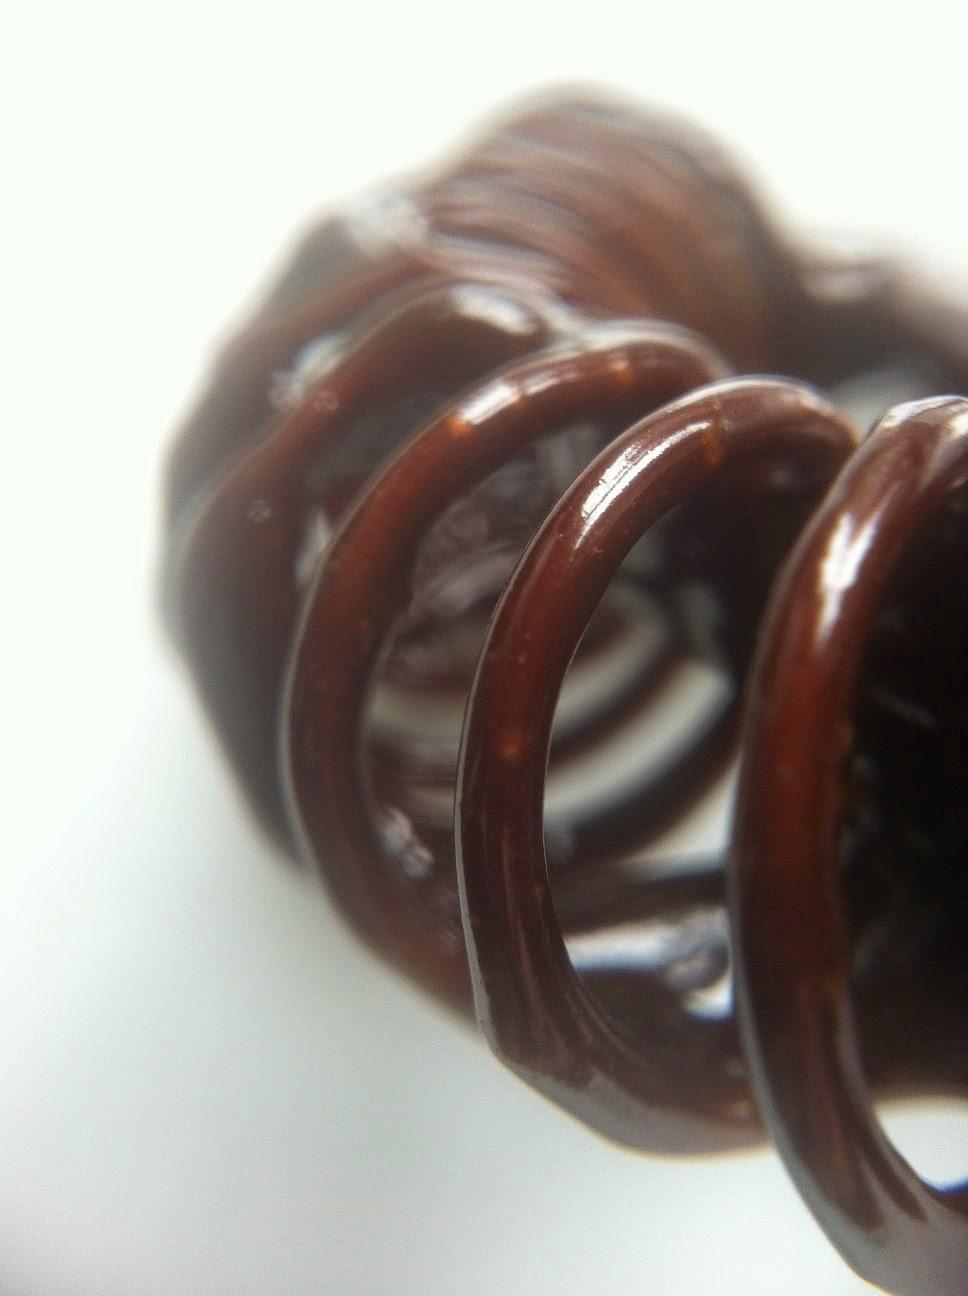 Makro Schokolade Backen